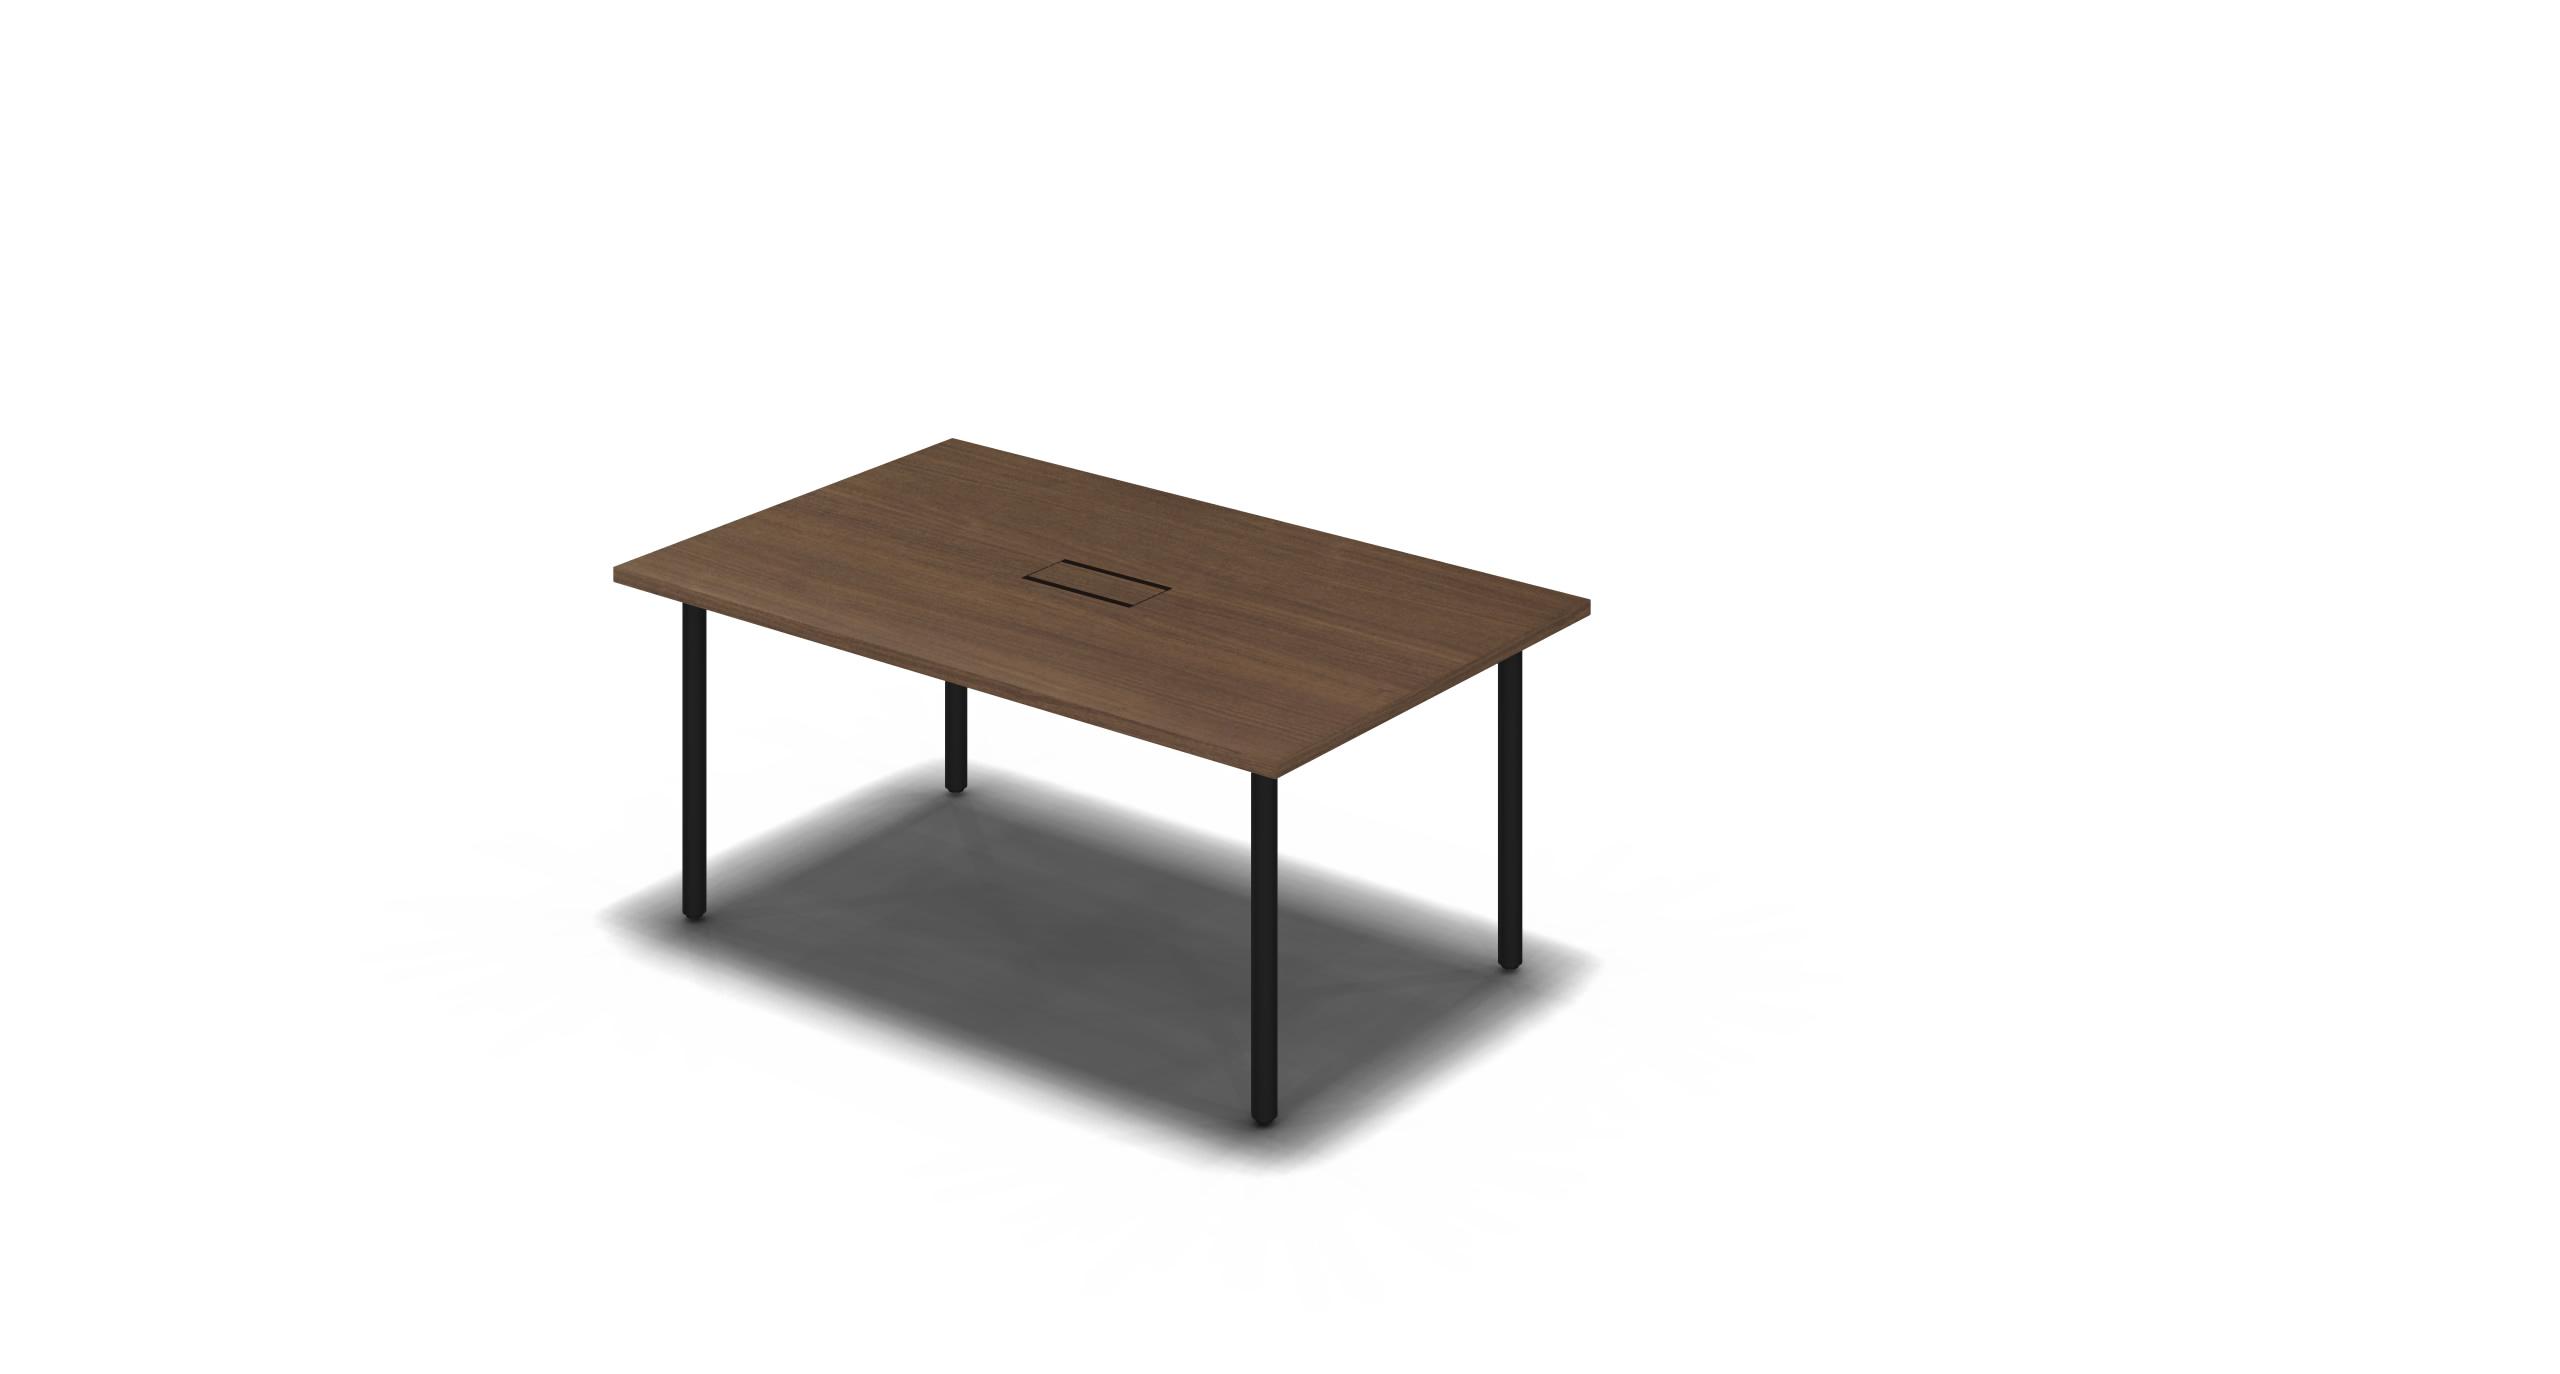 Table_Round_1500x900_Black_Walnut_withOption